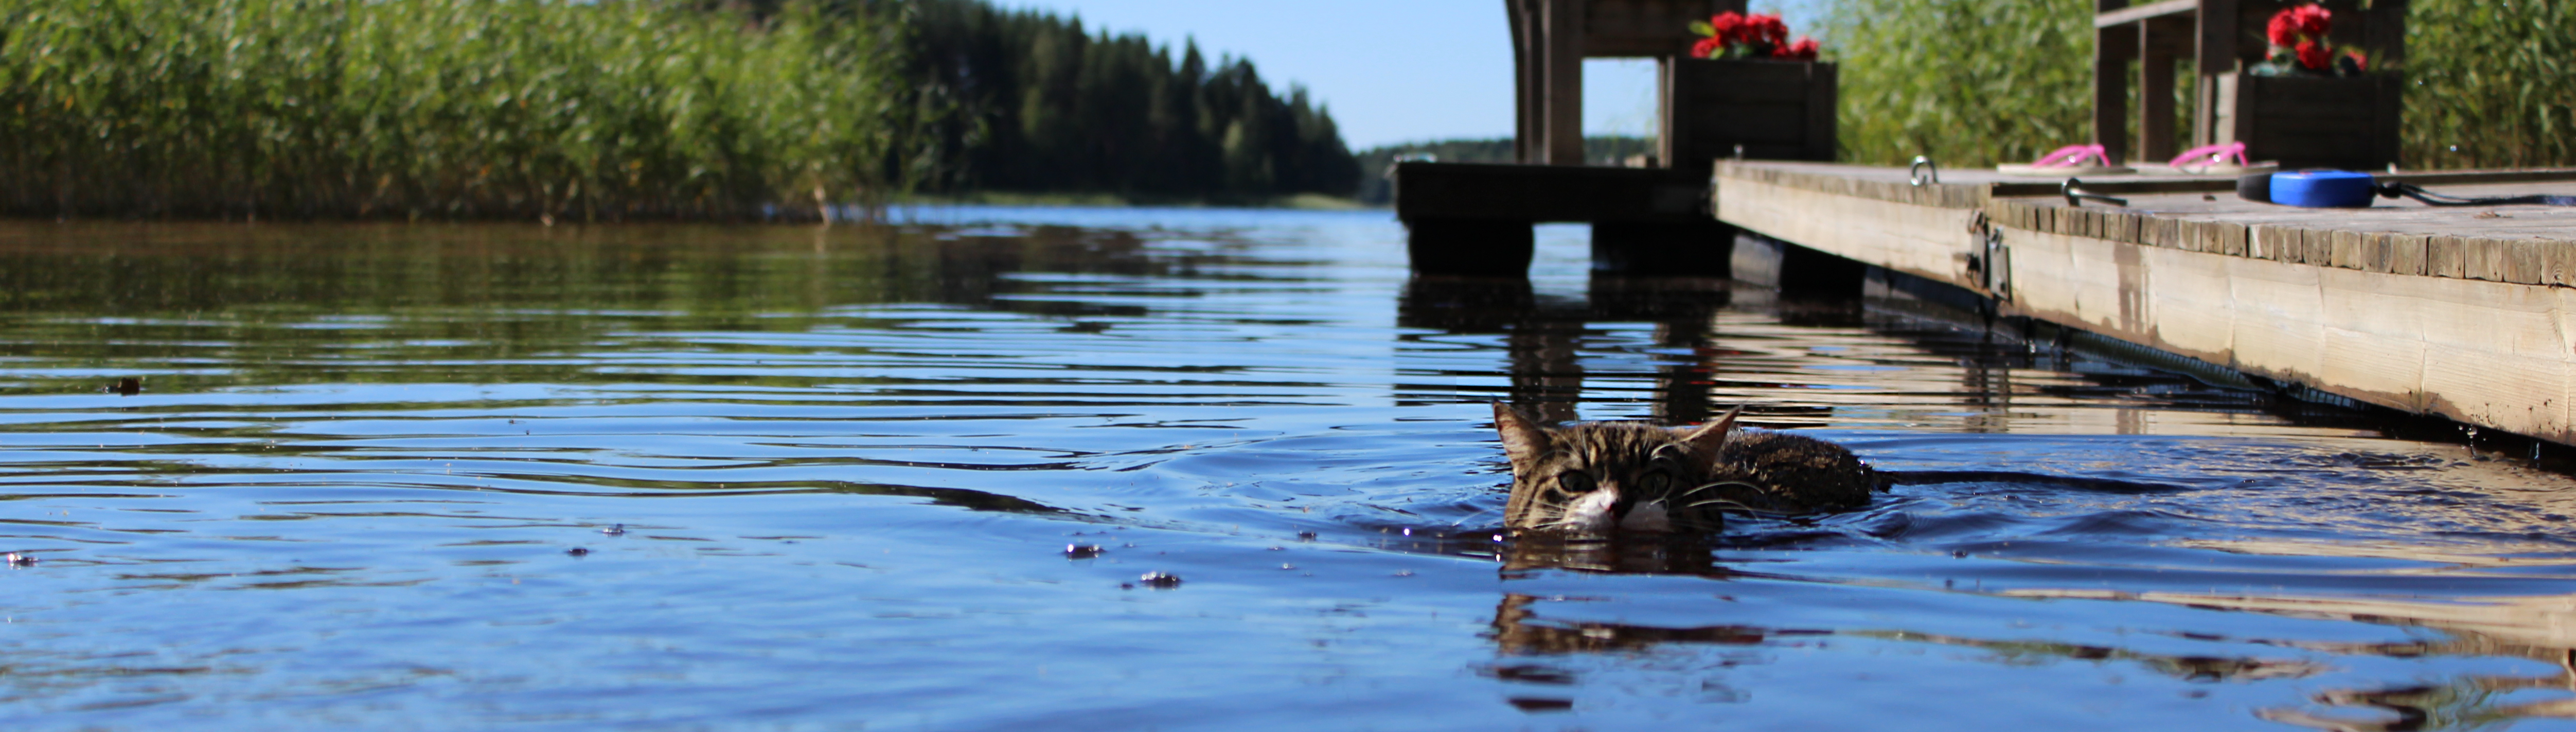 Miisa having a quick swim.., Kissa, Katze, Katt, Miisa, HQ Photo